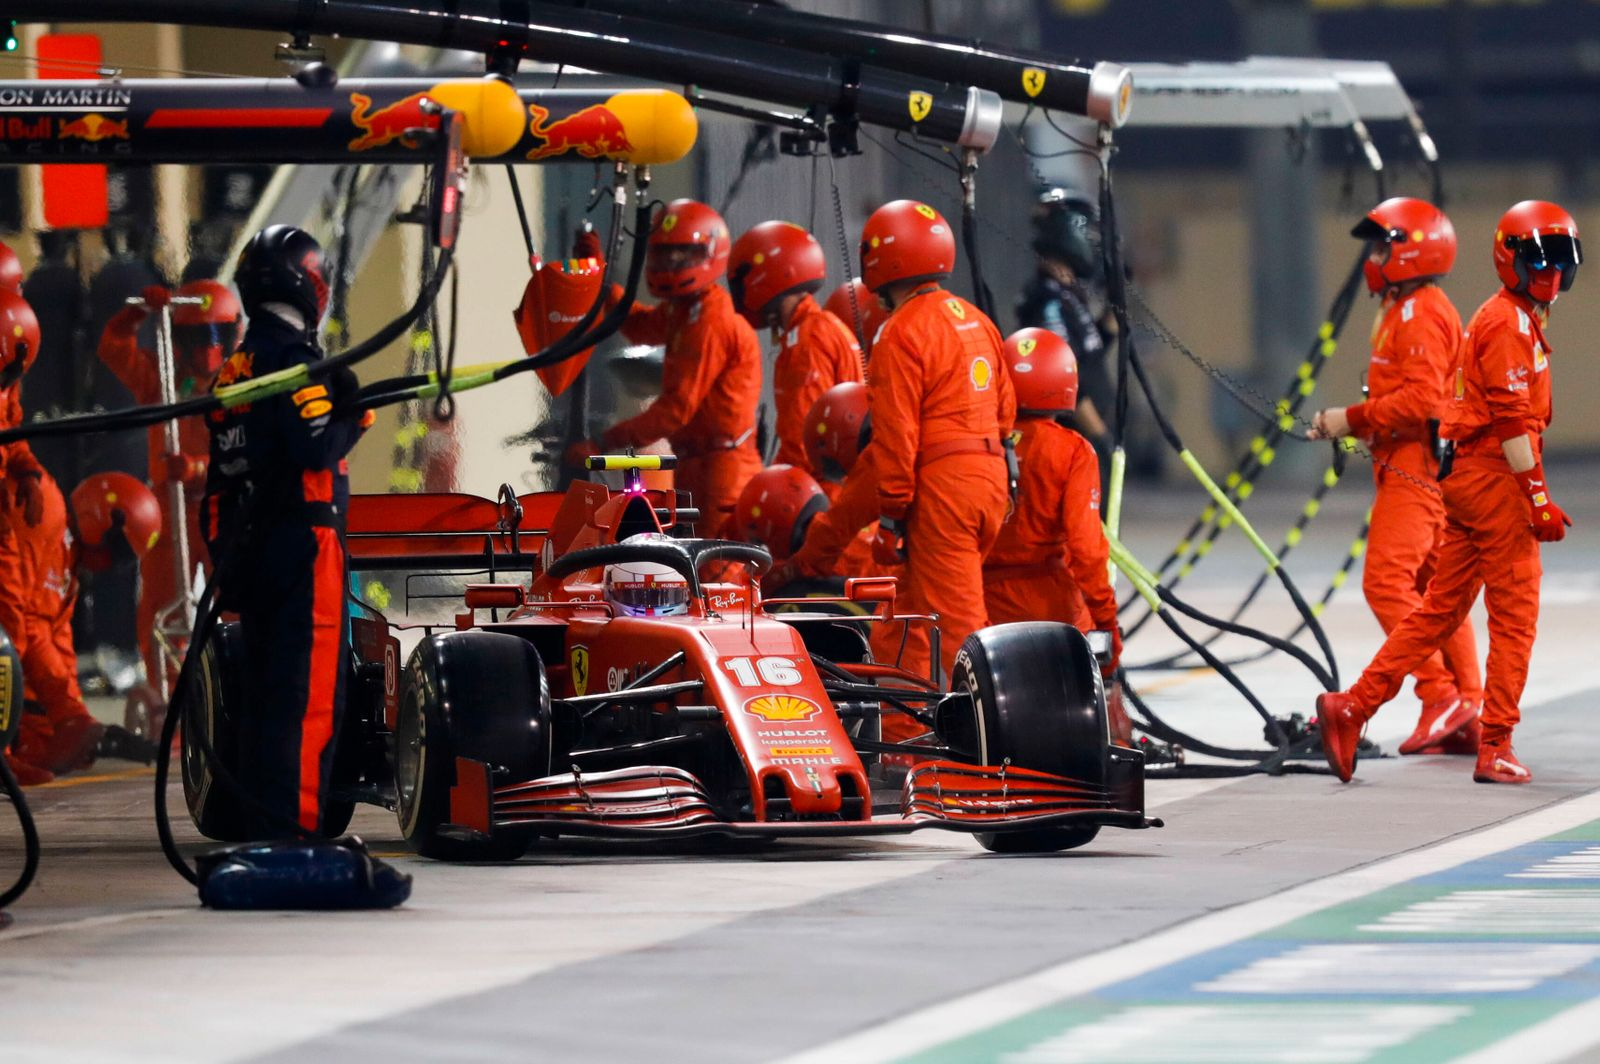 2020 Abu Dhabi GP YAS MARINA CIRCUIT, UNITED ARAB EMIRATES - DECEMBER 13: Charles Leclerc, Ferrari SF1000, leaves his pi